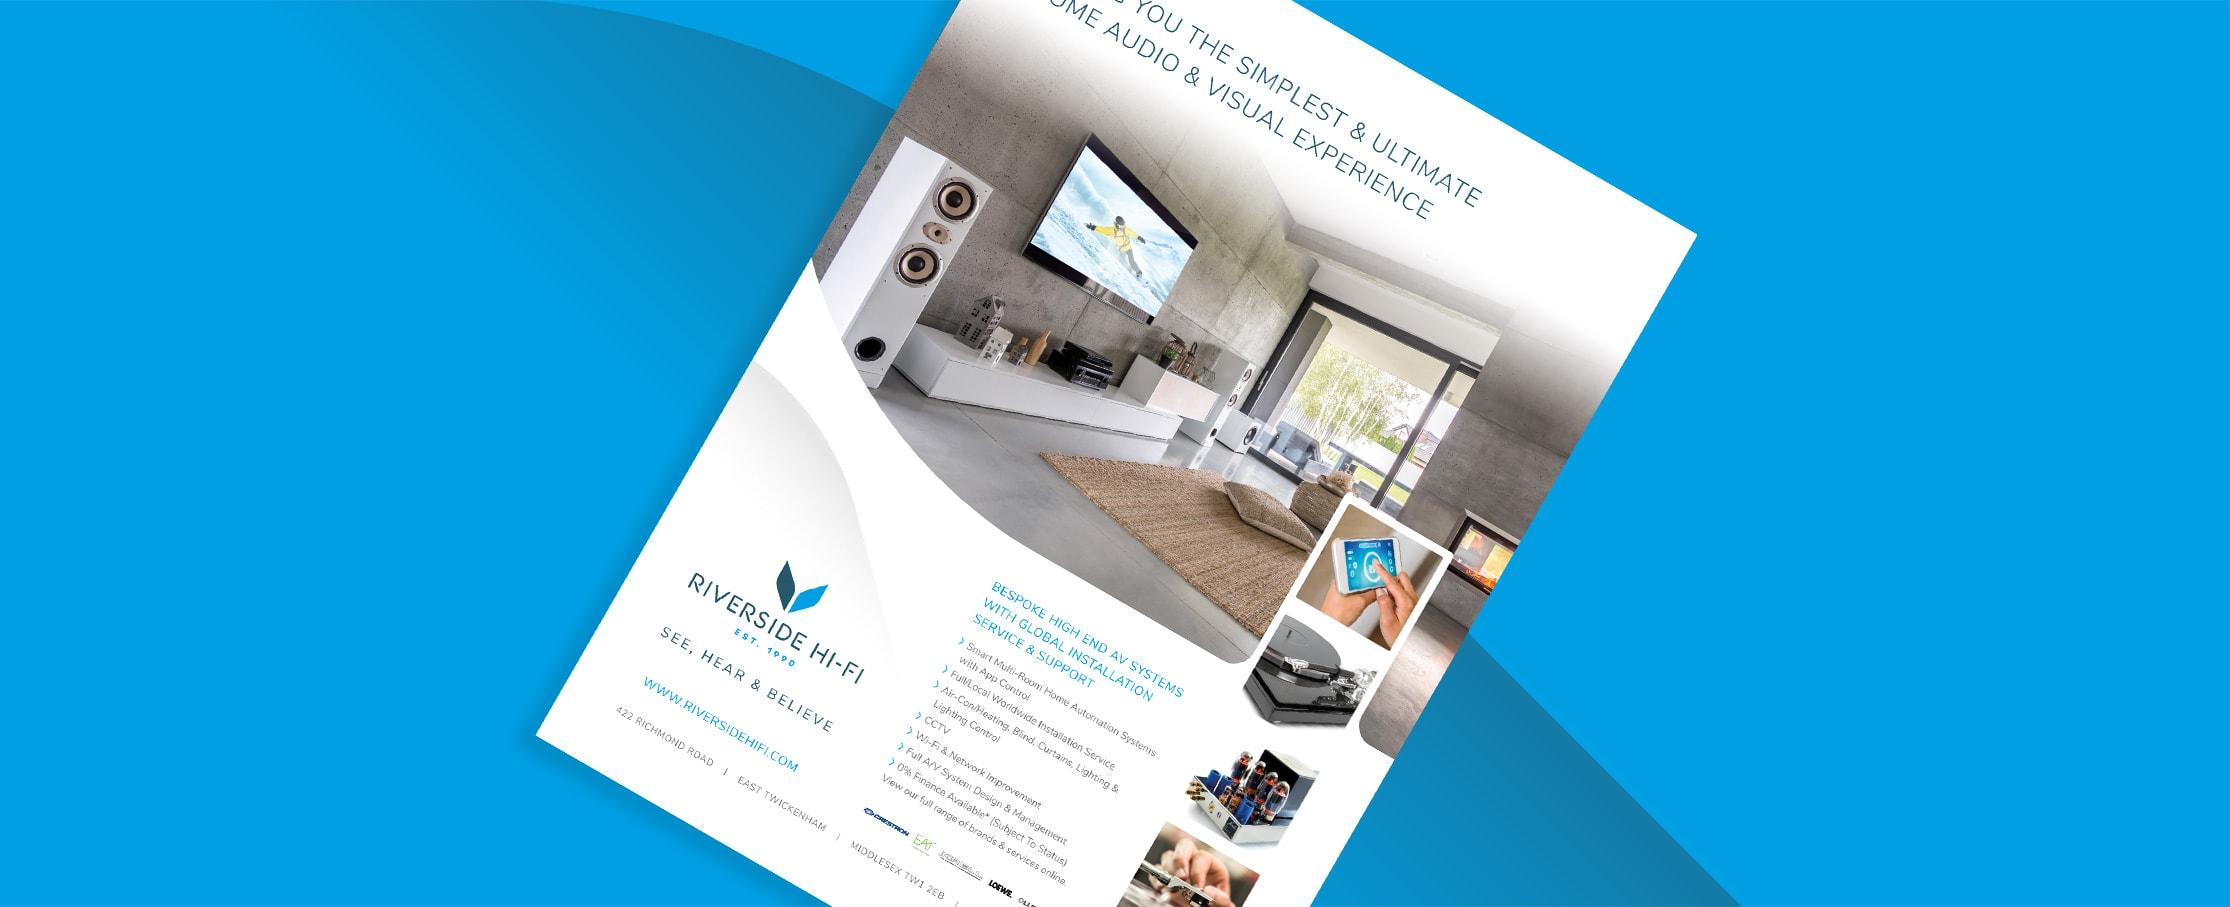 High end AV advertising designs Riverside Hi-Fi